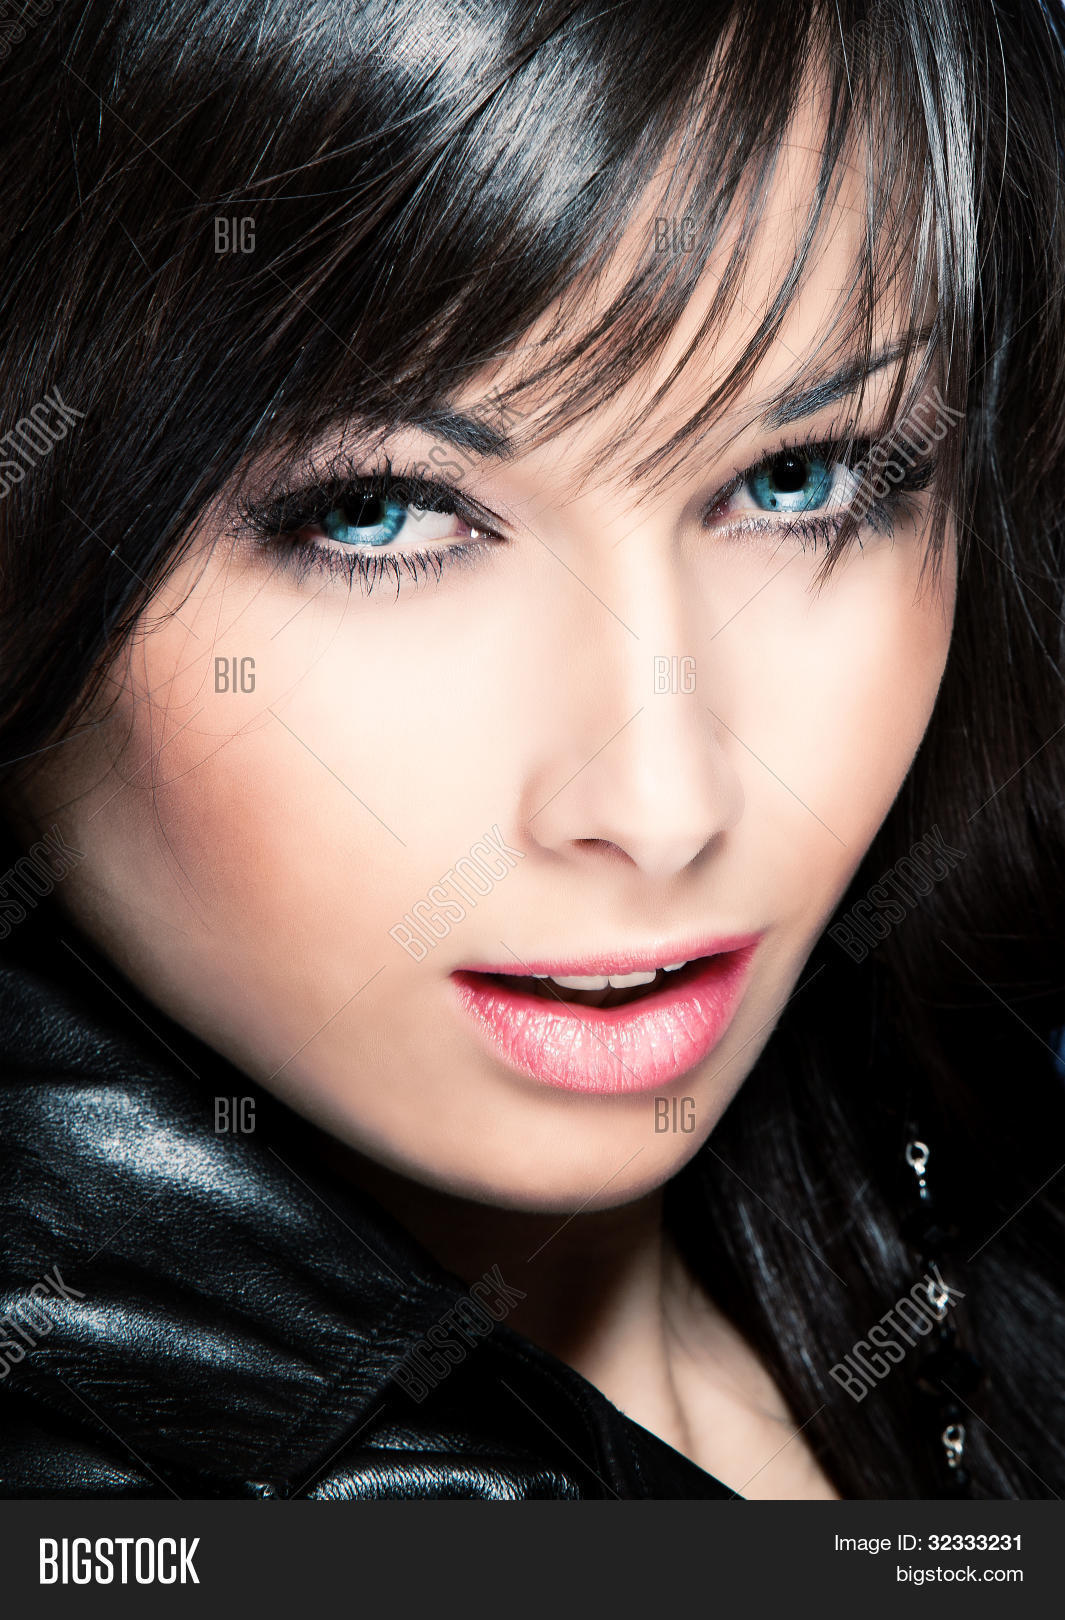 Black hair blue eyes dating